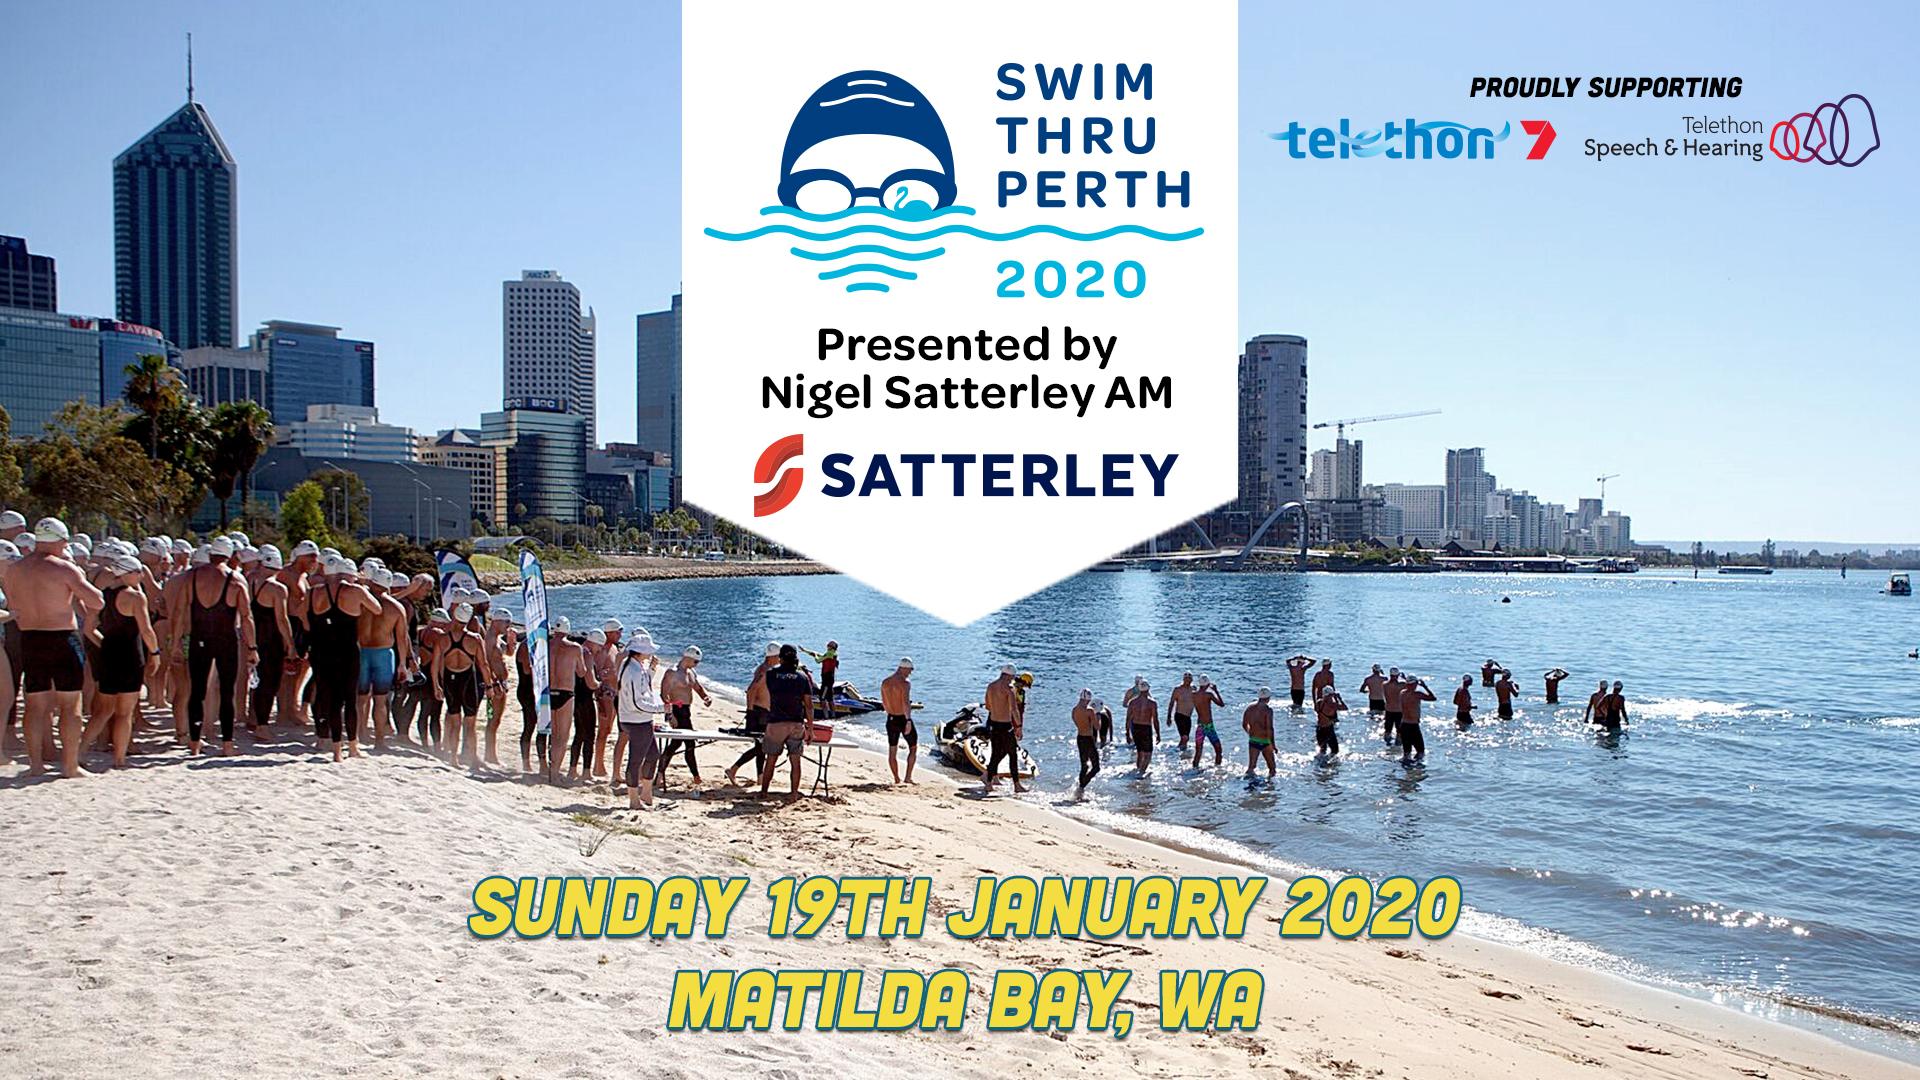 Swim Thru Perth 2020